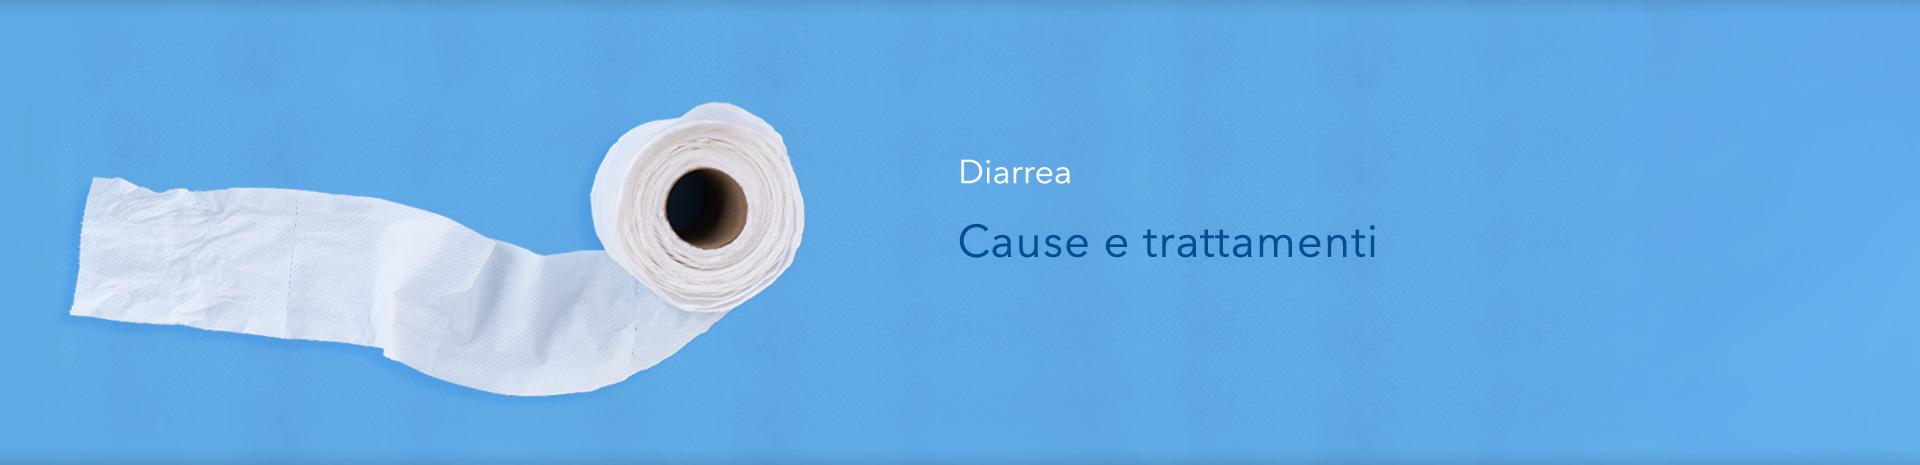 Diarrea - GUIDA - SHOP FARMACIA